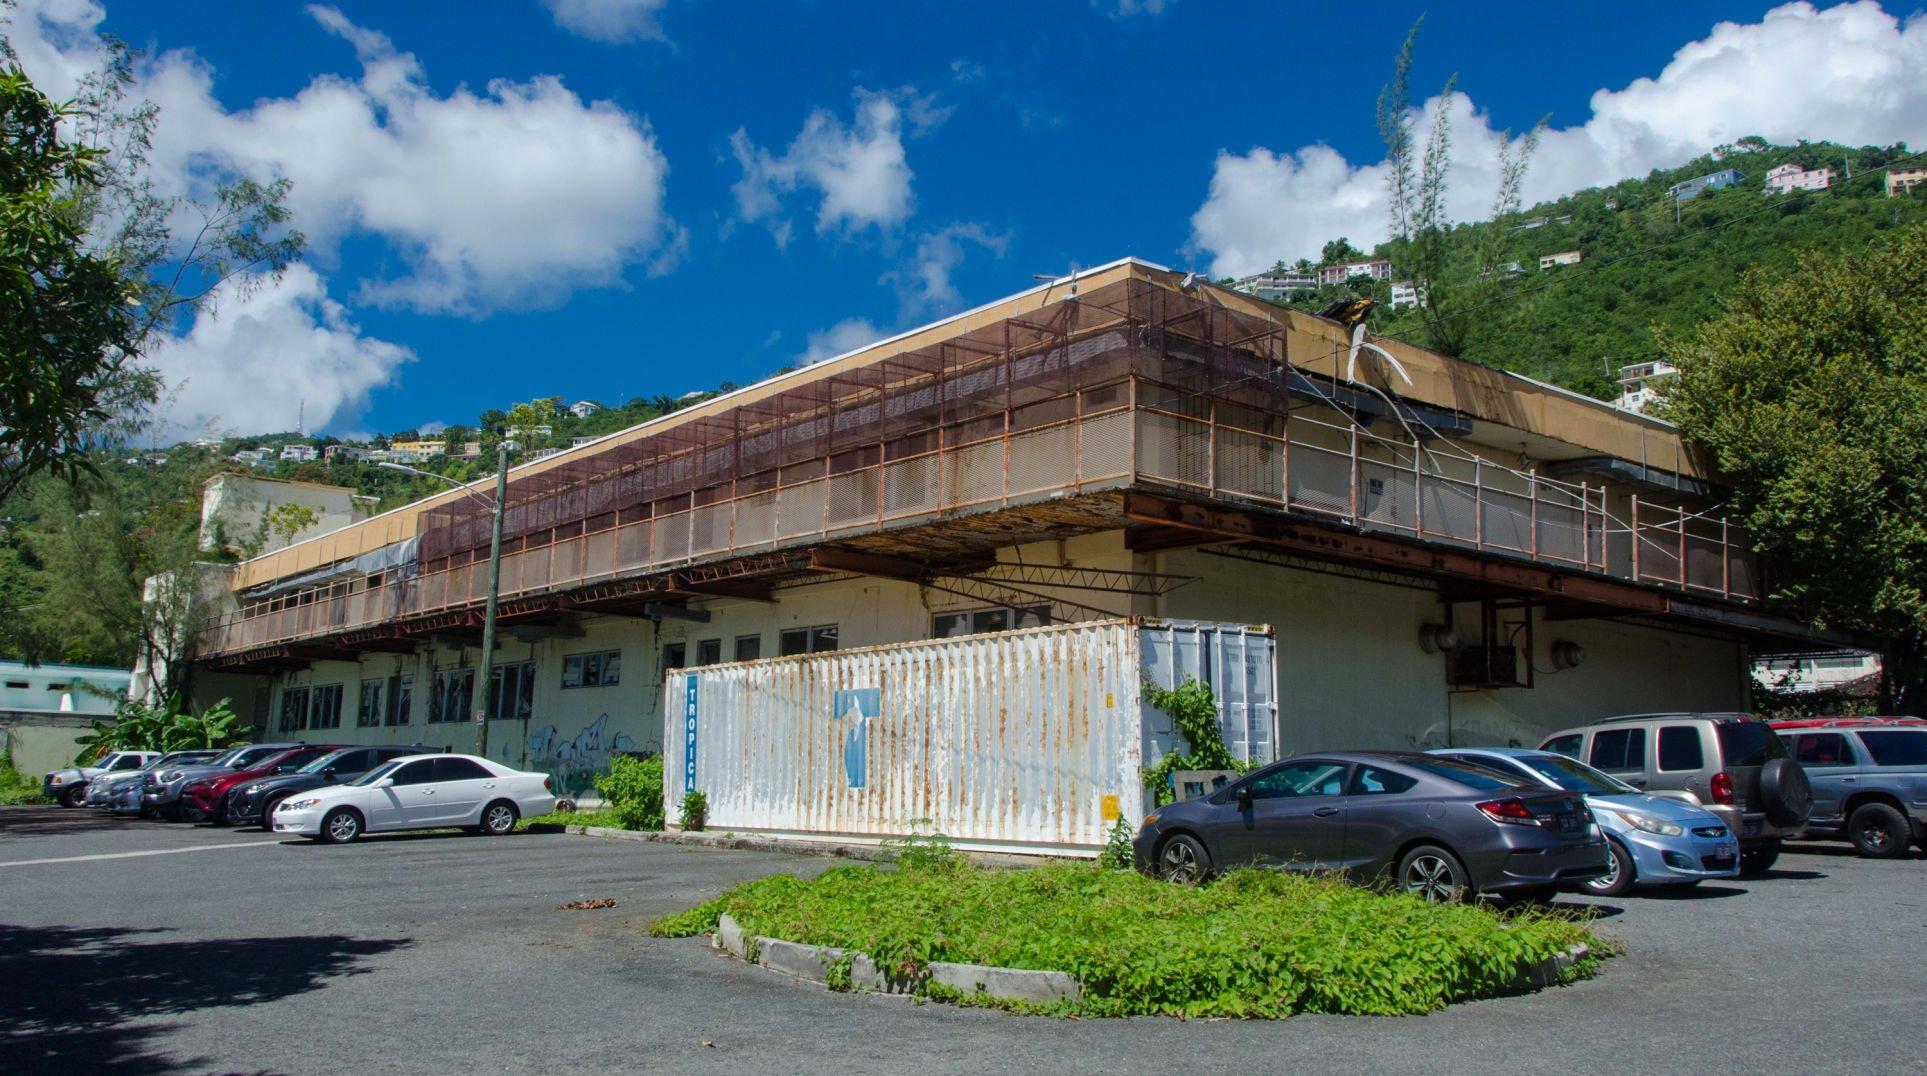 Health awarded $1.8 million to demolish abandoned St. Thomas mental health building